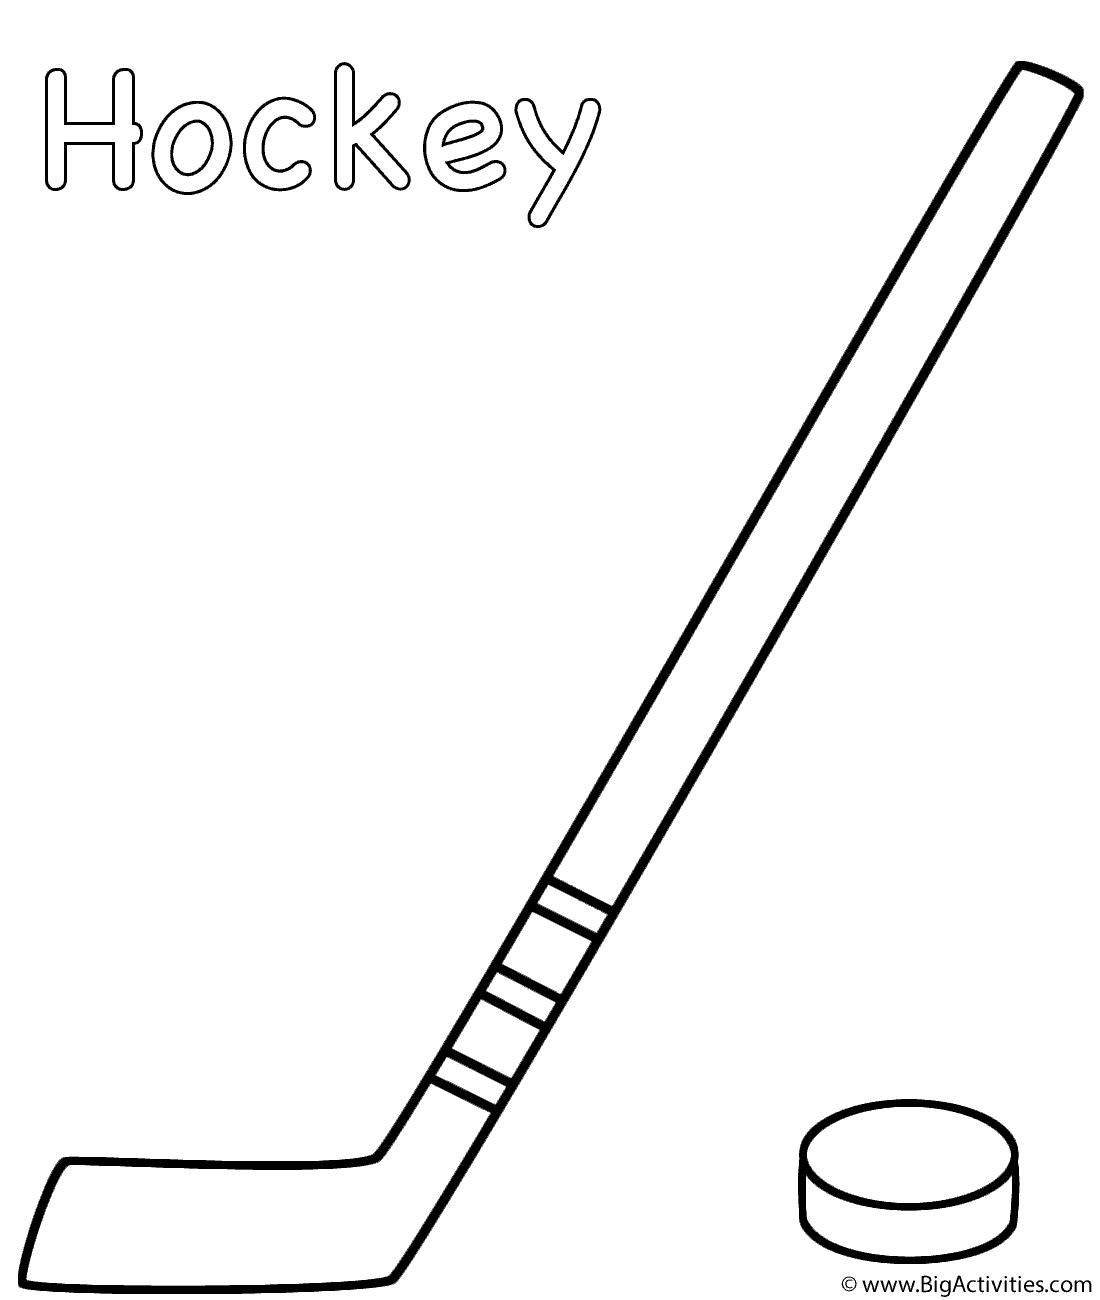 Pin By Janet Bowker On Hockey Hockey Stick Ice Hockey Sticks Hockey